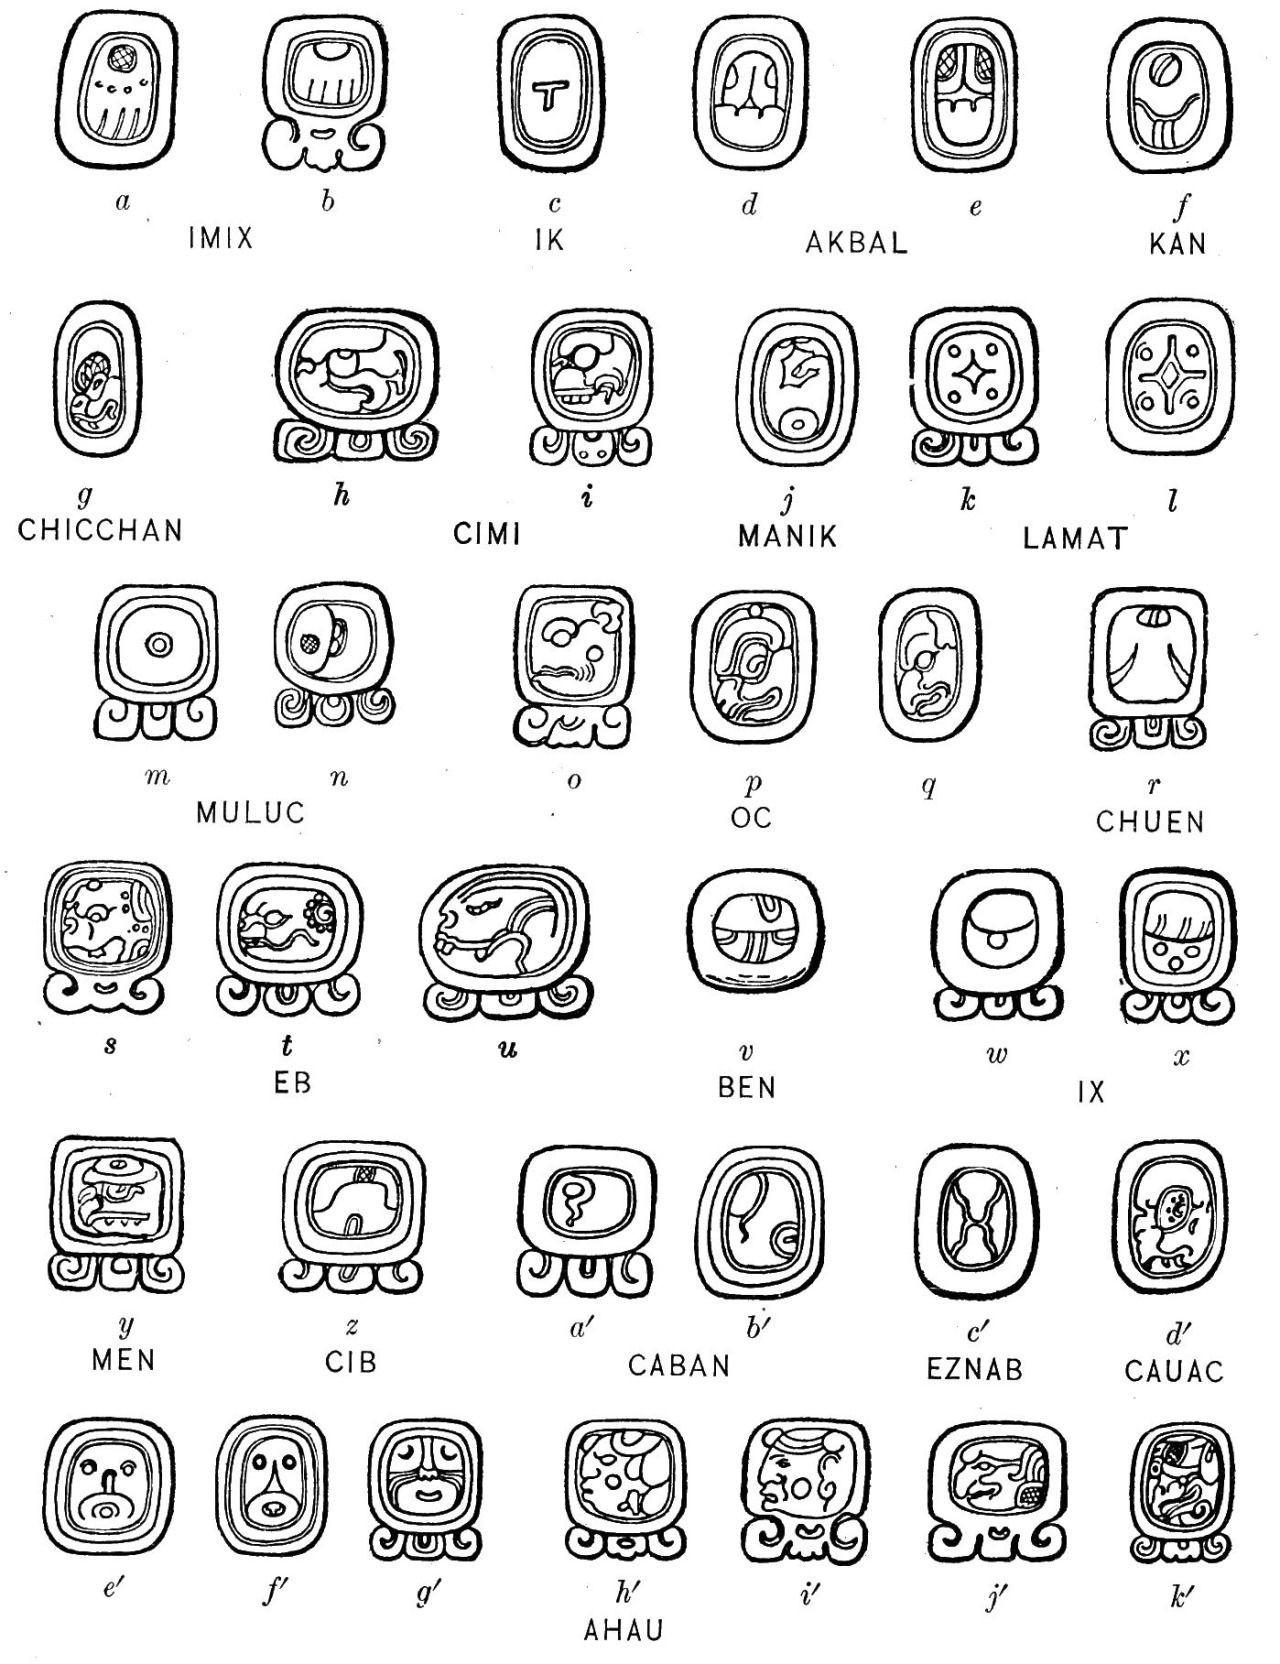 calendario julio 2017 colombia para imprimir